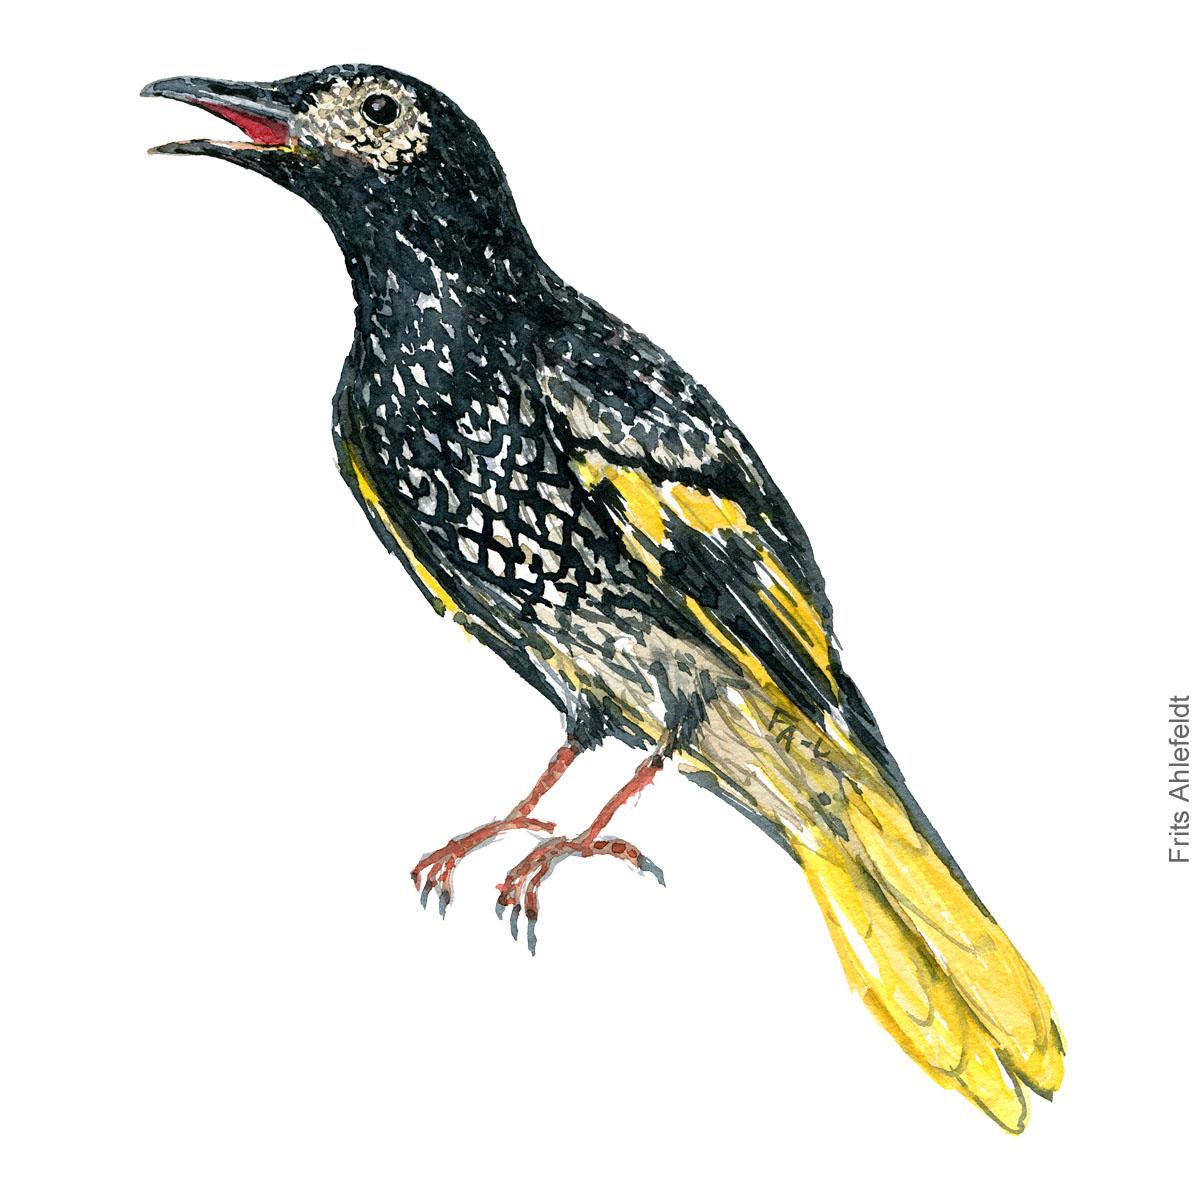 Watercolor illustration of Australian Honeyeater bird - artwork by Frits Ahlefeldt